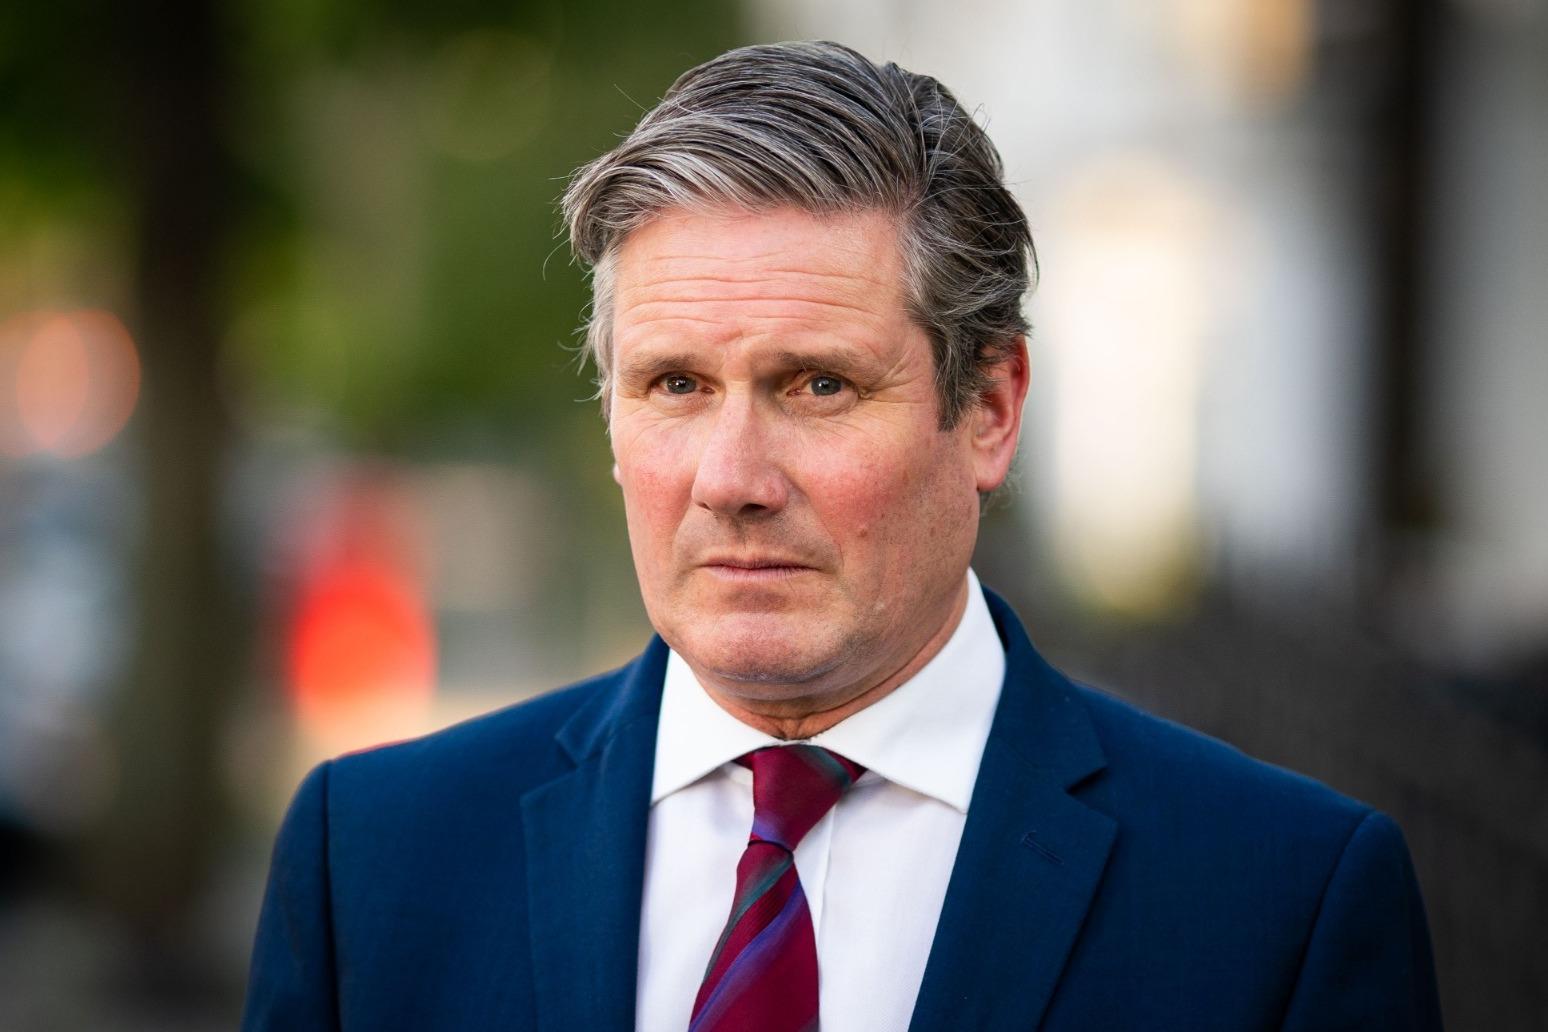 Starmer says UK entering critical week